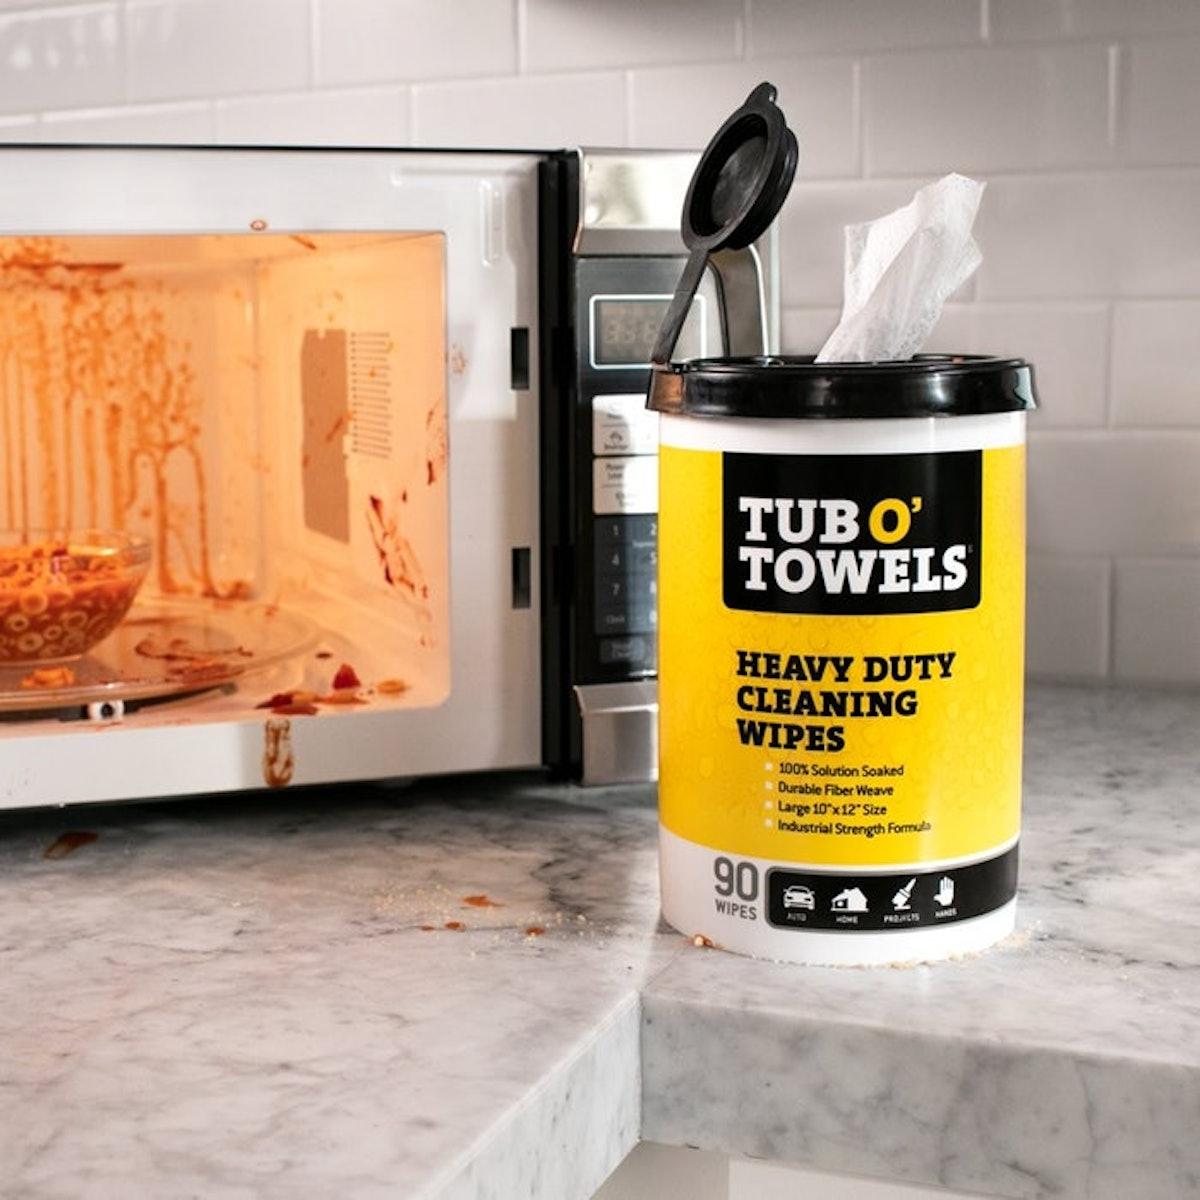 Tub O Towels Cleaning Wipes